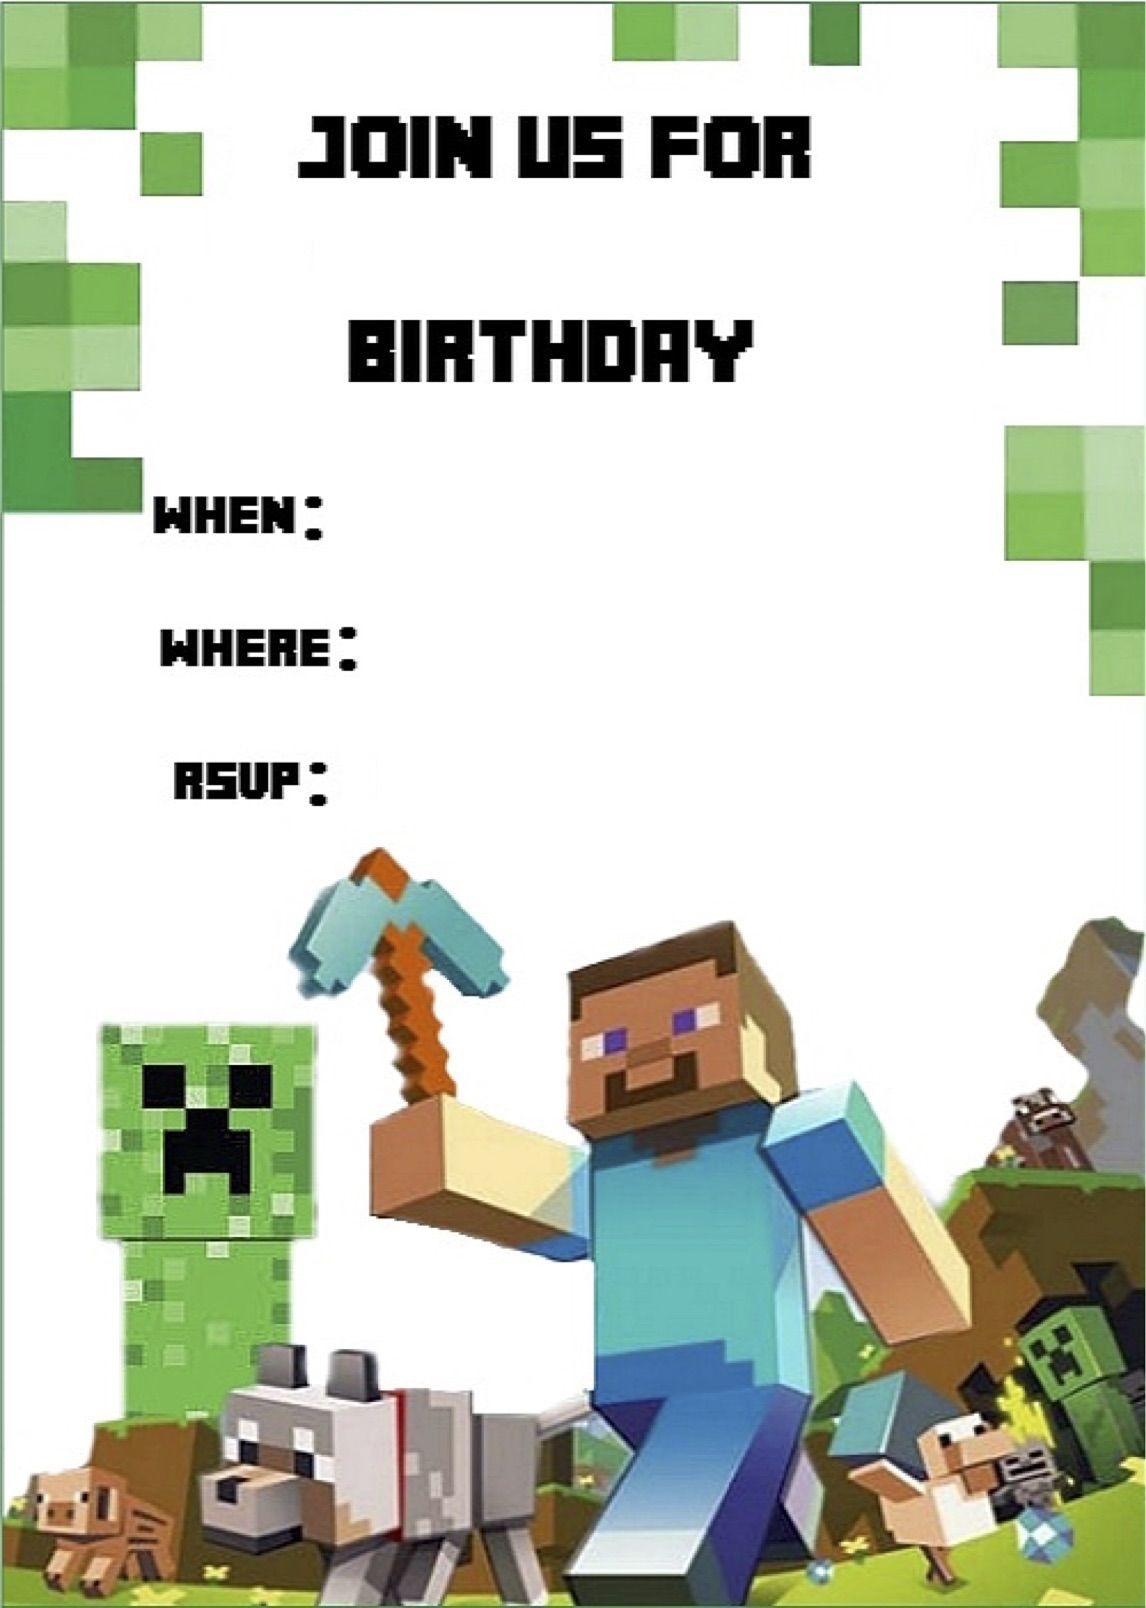 Minecraft Invite | Daan - Minecraft Invitations, Minecraft Birthday - Free Printable Minecraft Birthday Party Invitations Templates